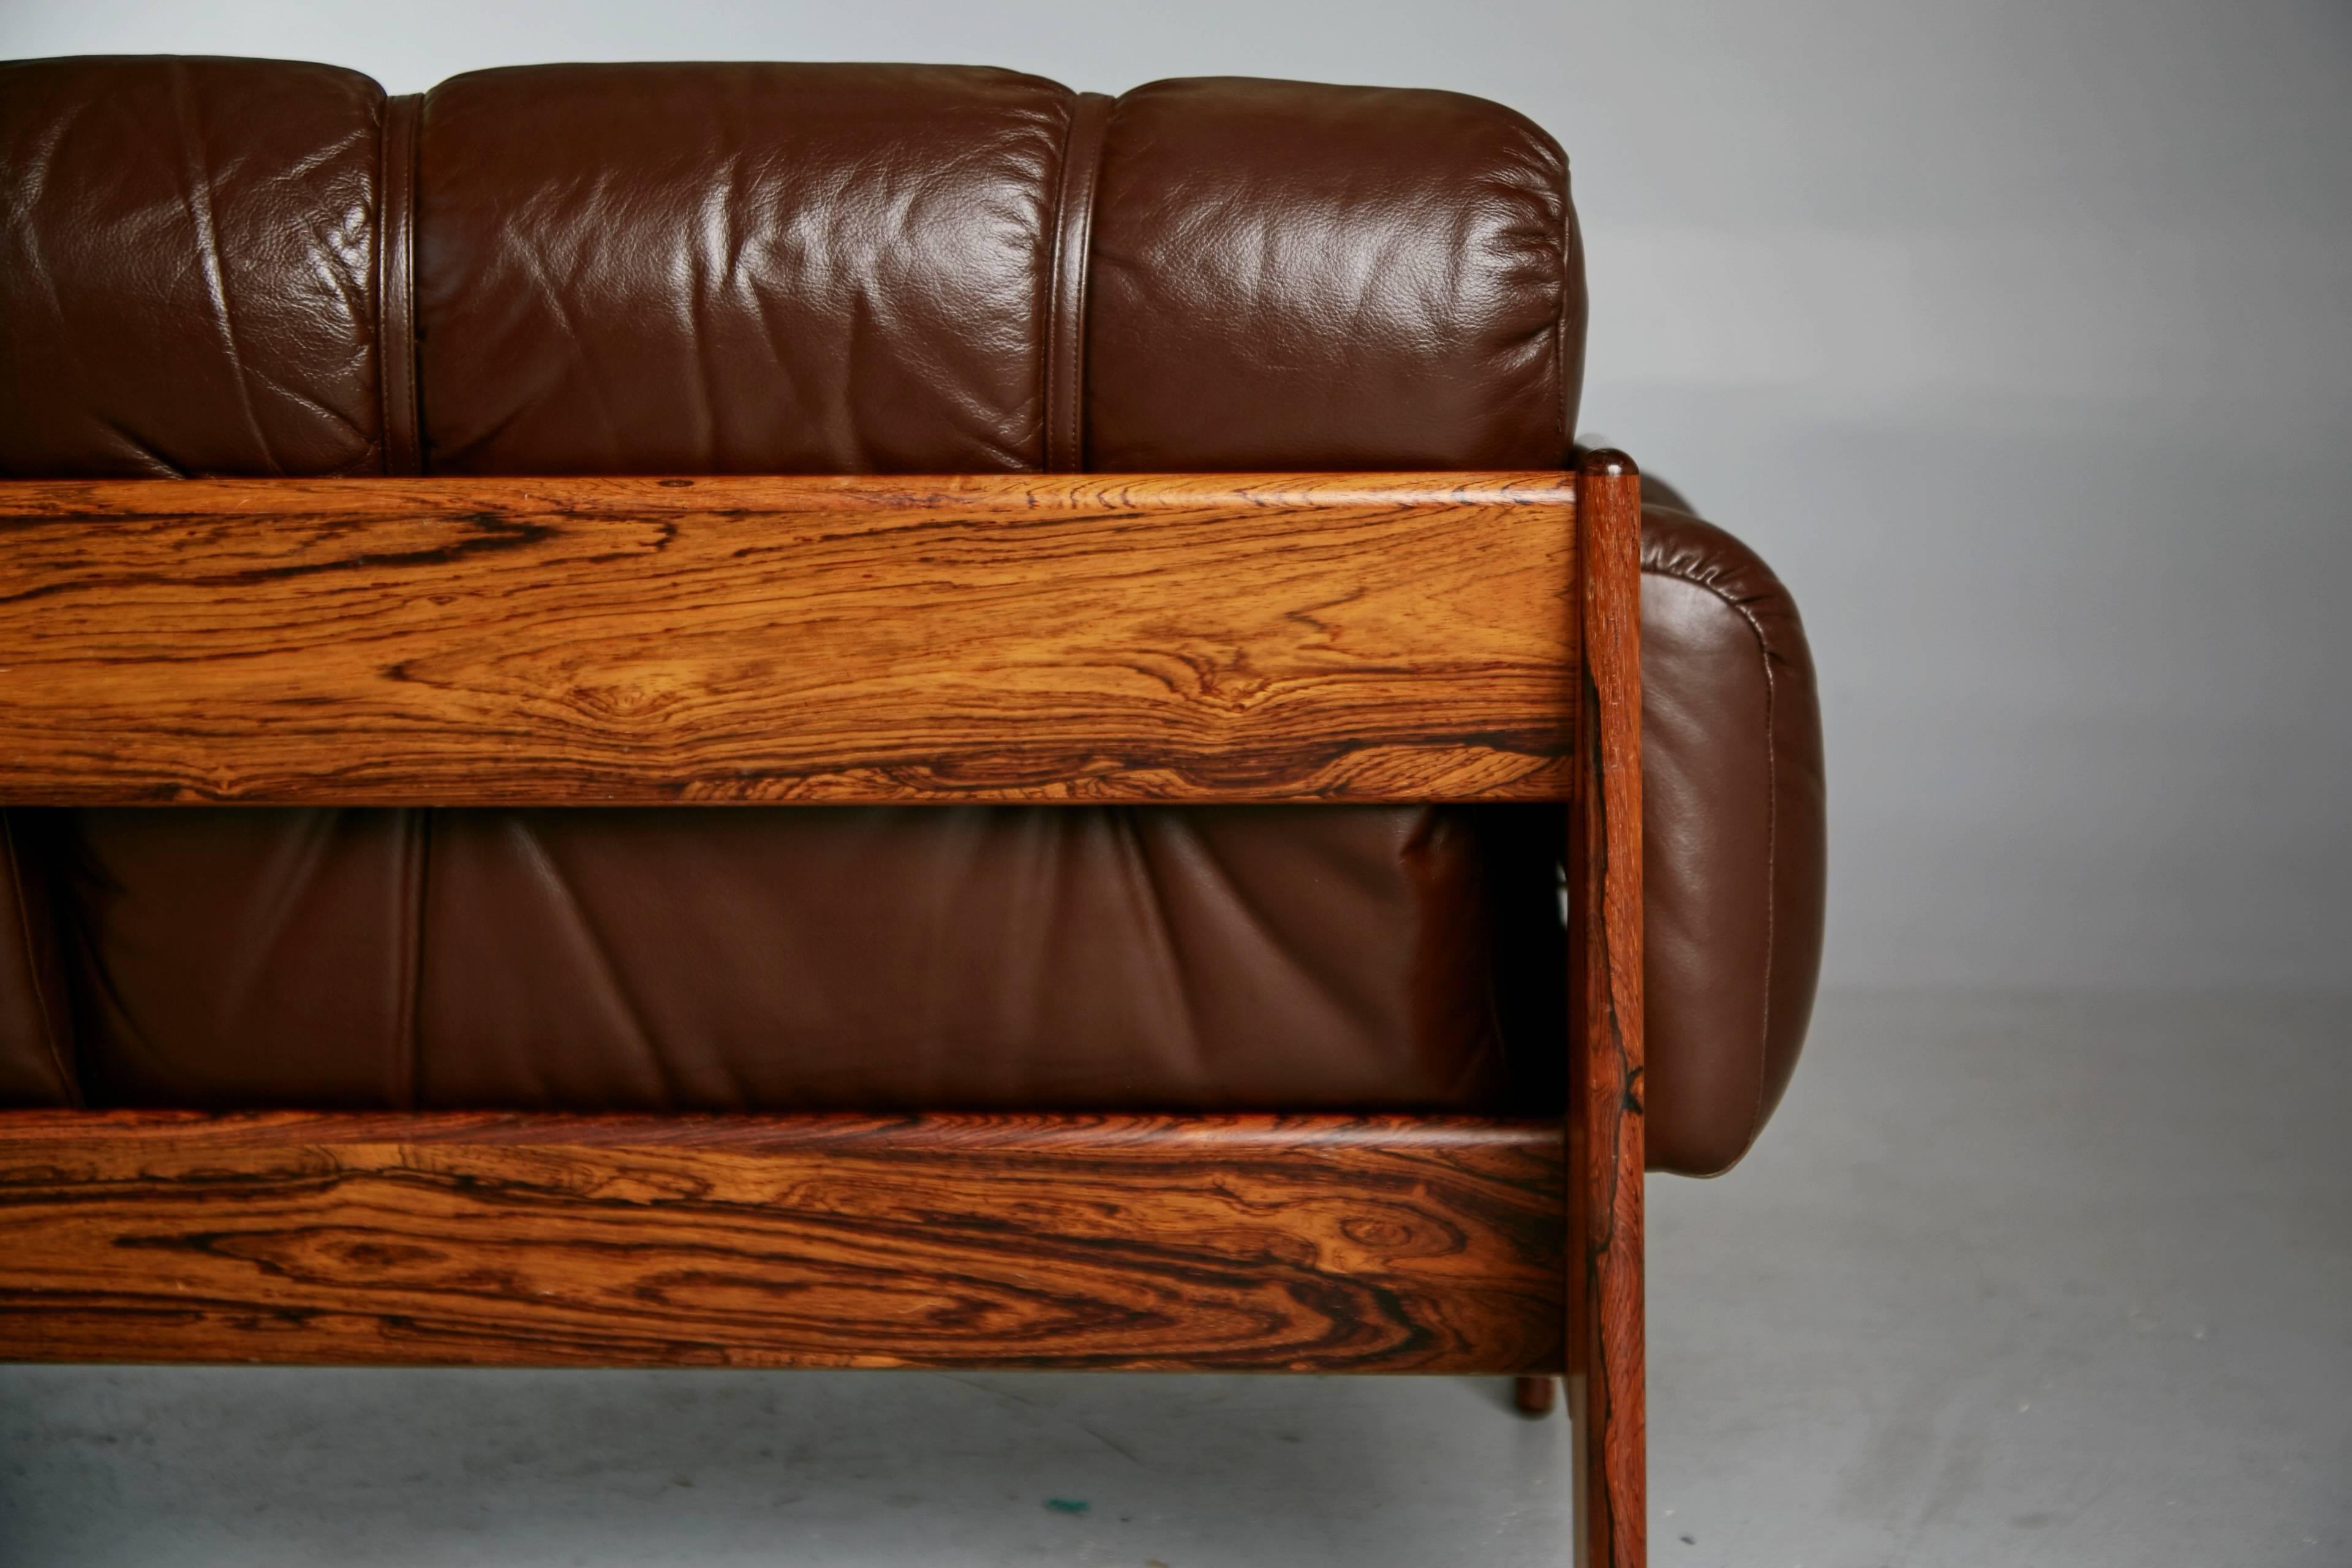 Tufted Leather Loveseat By Kalustekiila Finland Circa 1950 At 1stdibs